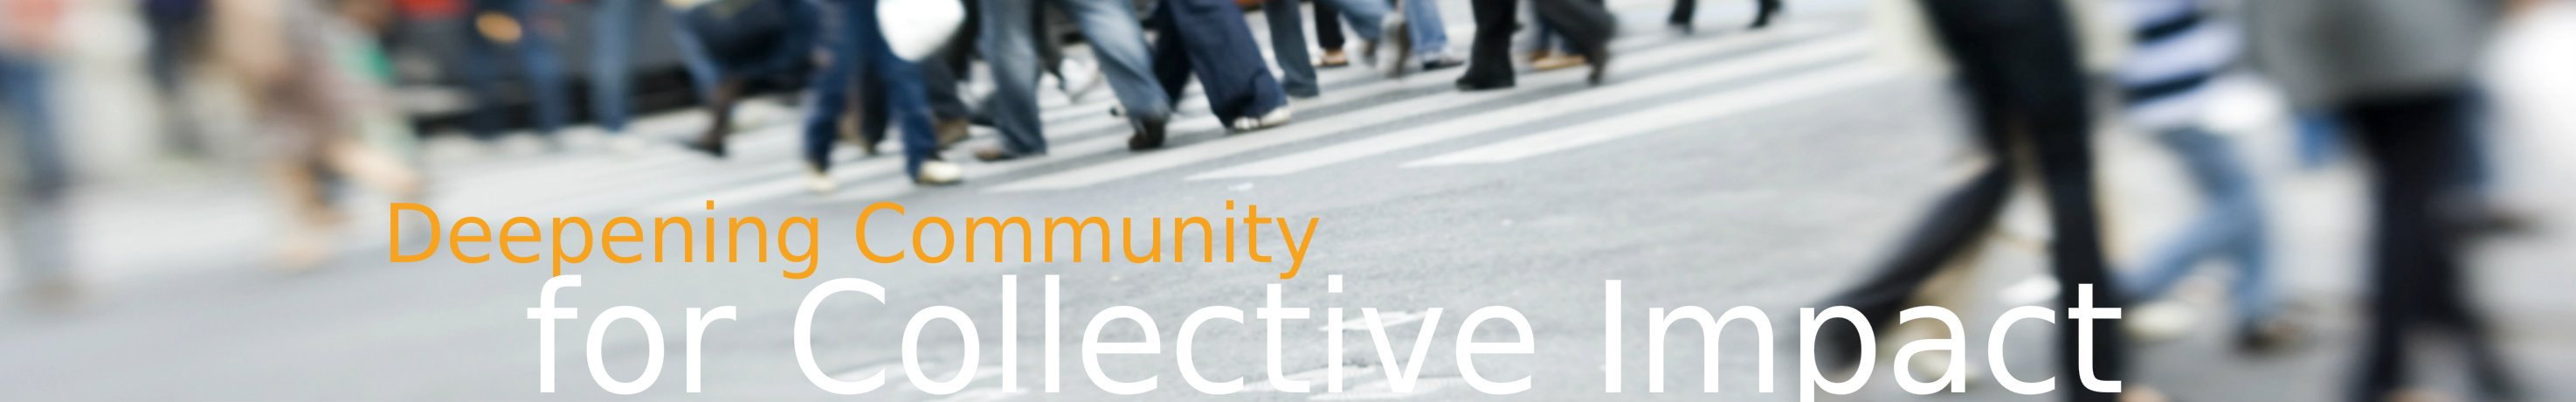 Banner_Deepening_Community4